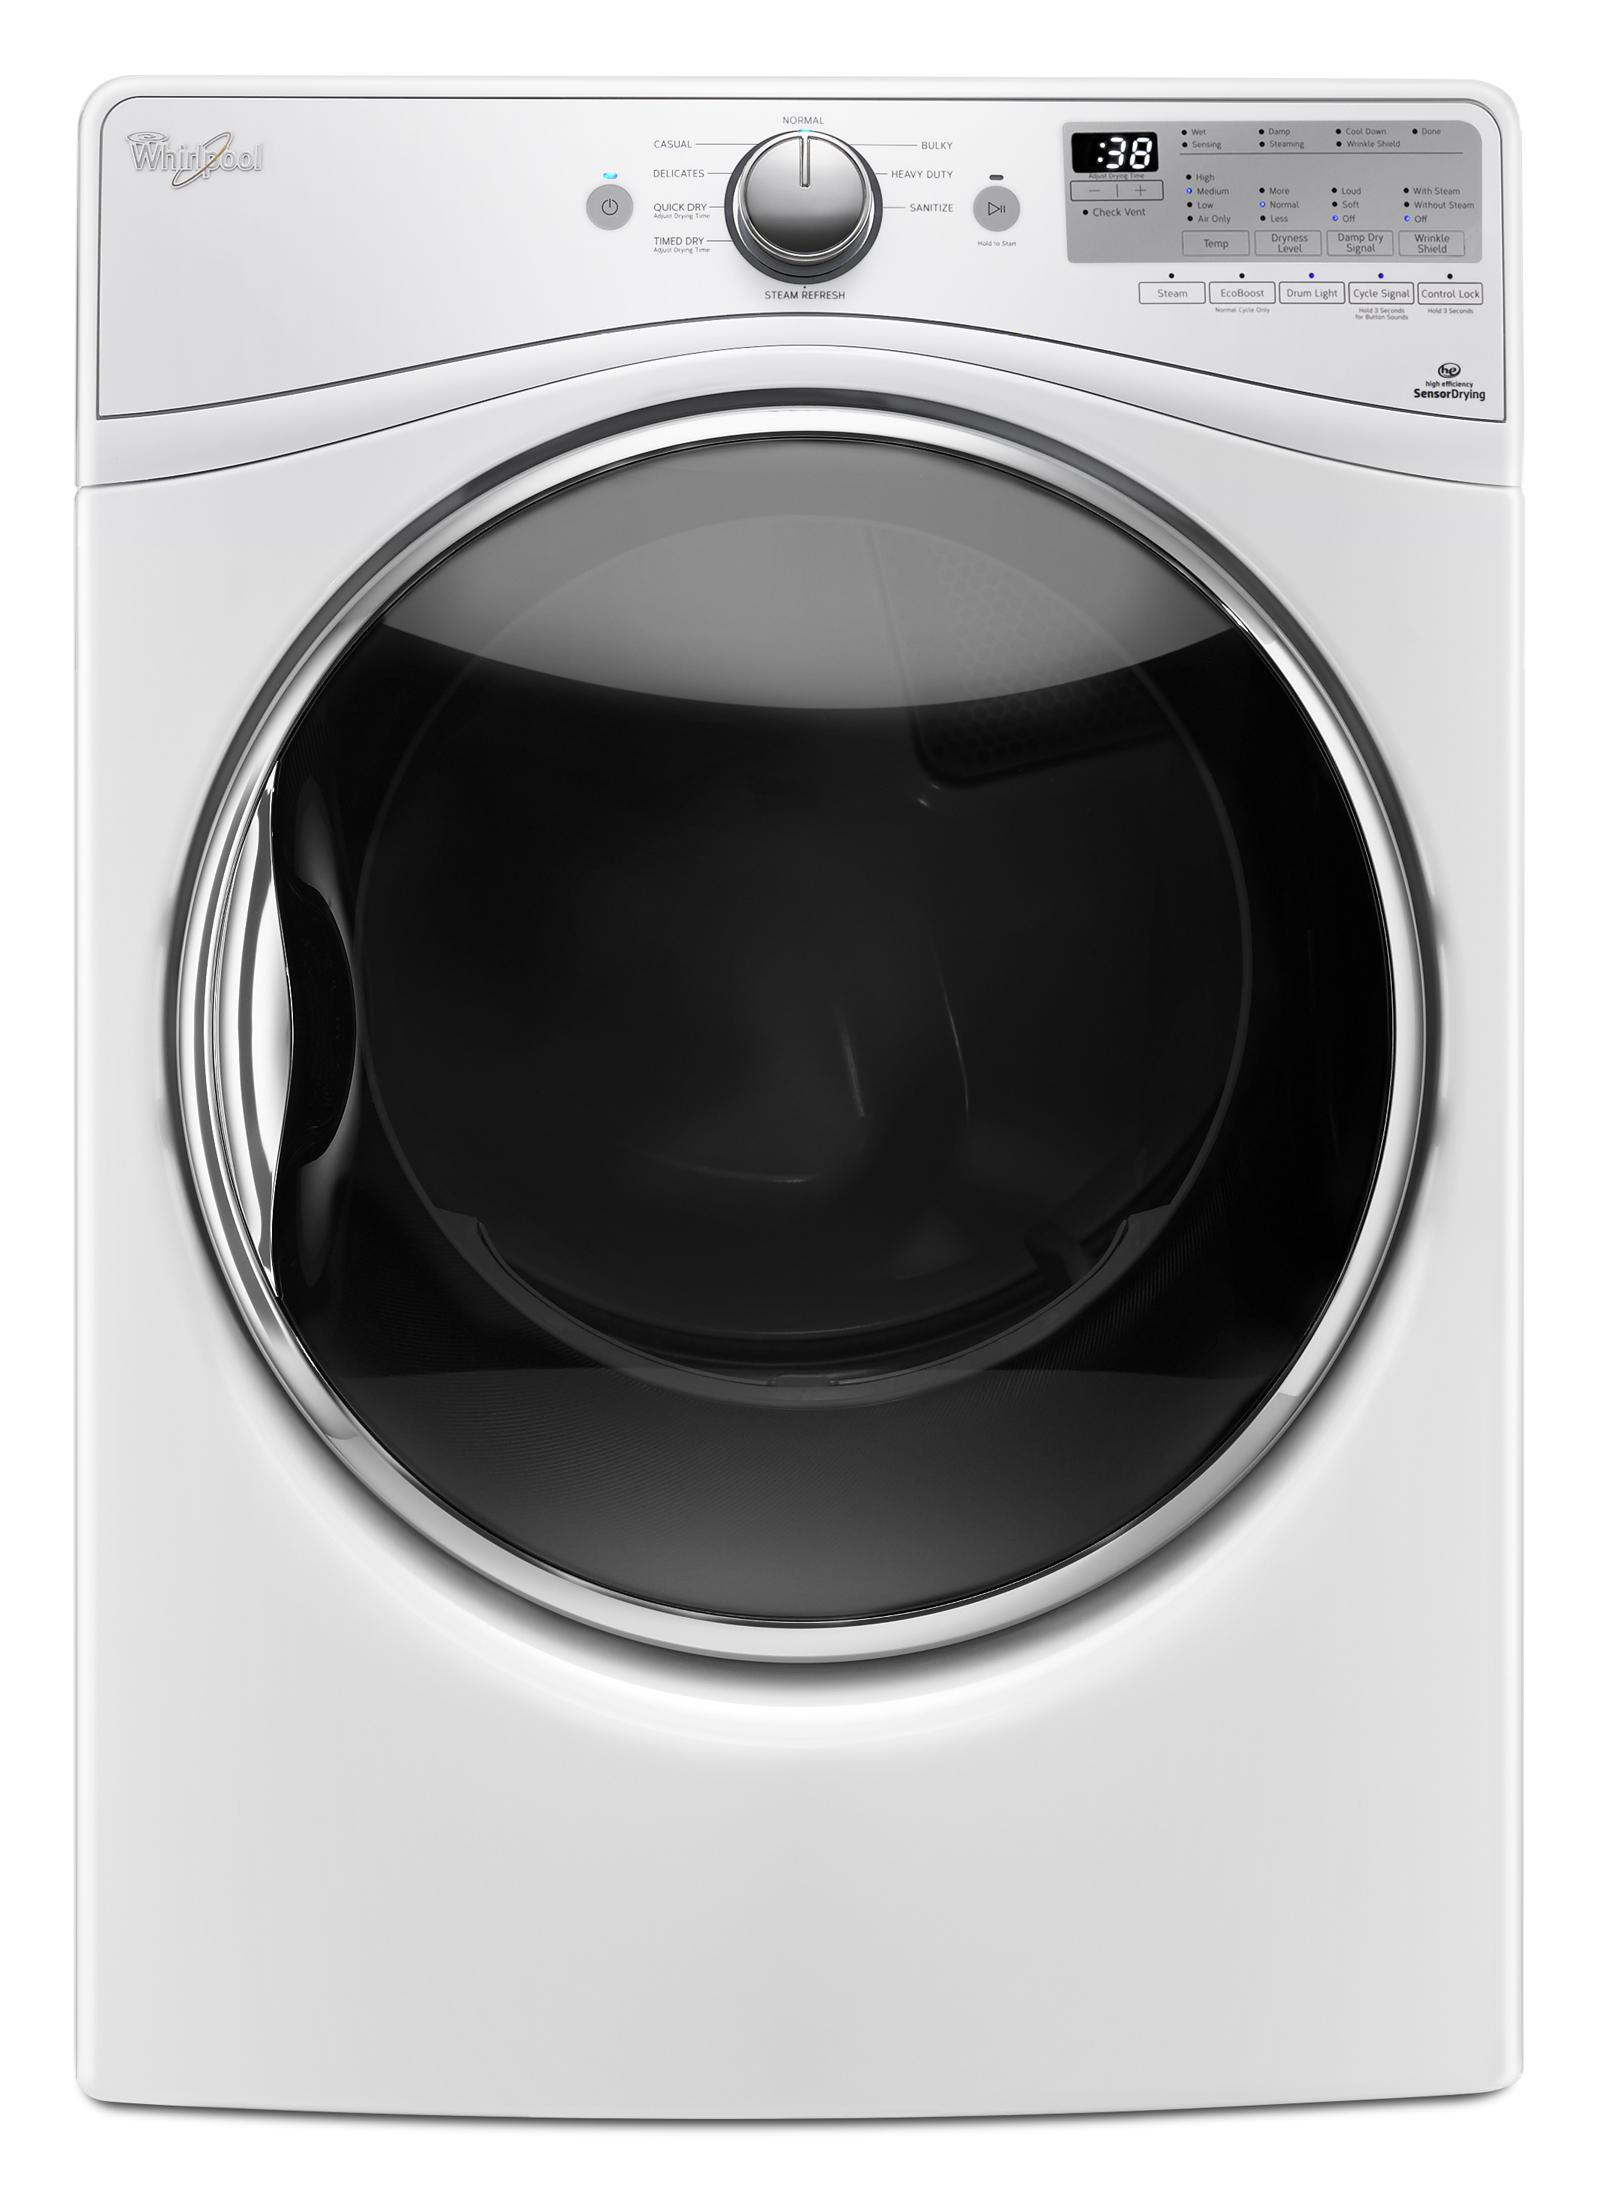 Whirlpool WGD90HEFW 7.4 cu. ft. Gas Dryer - White